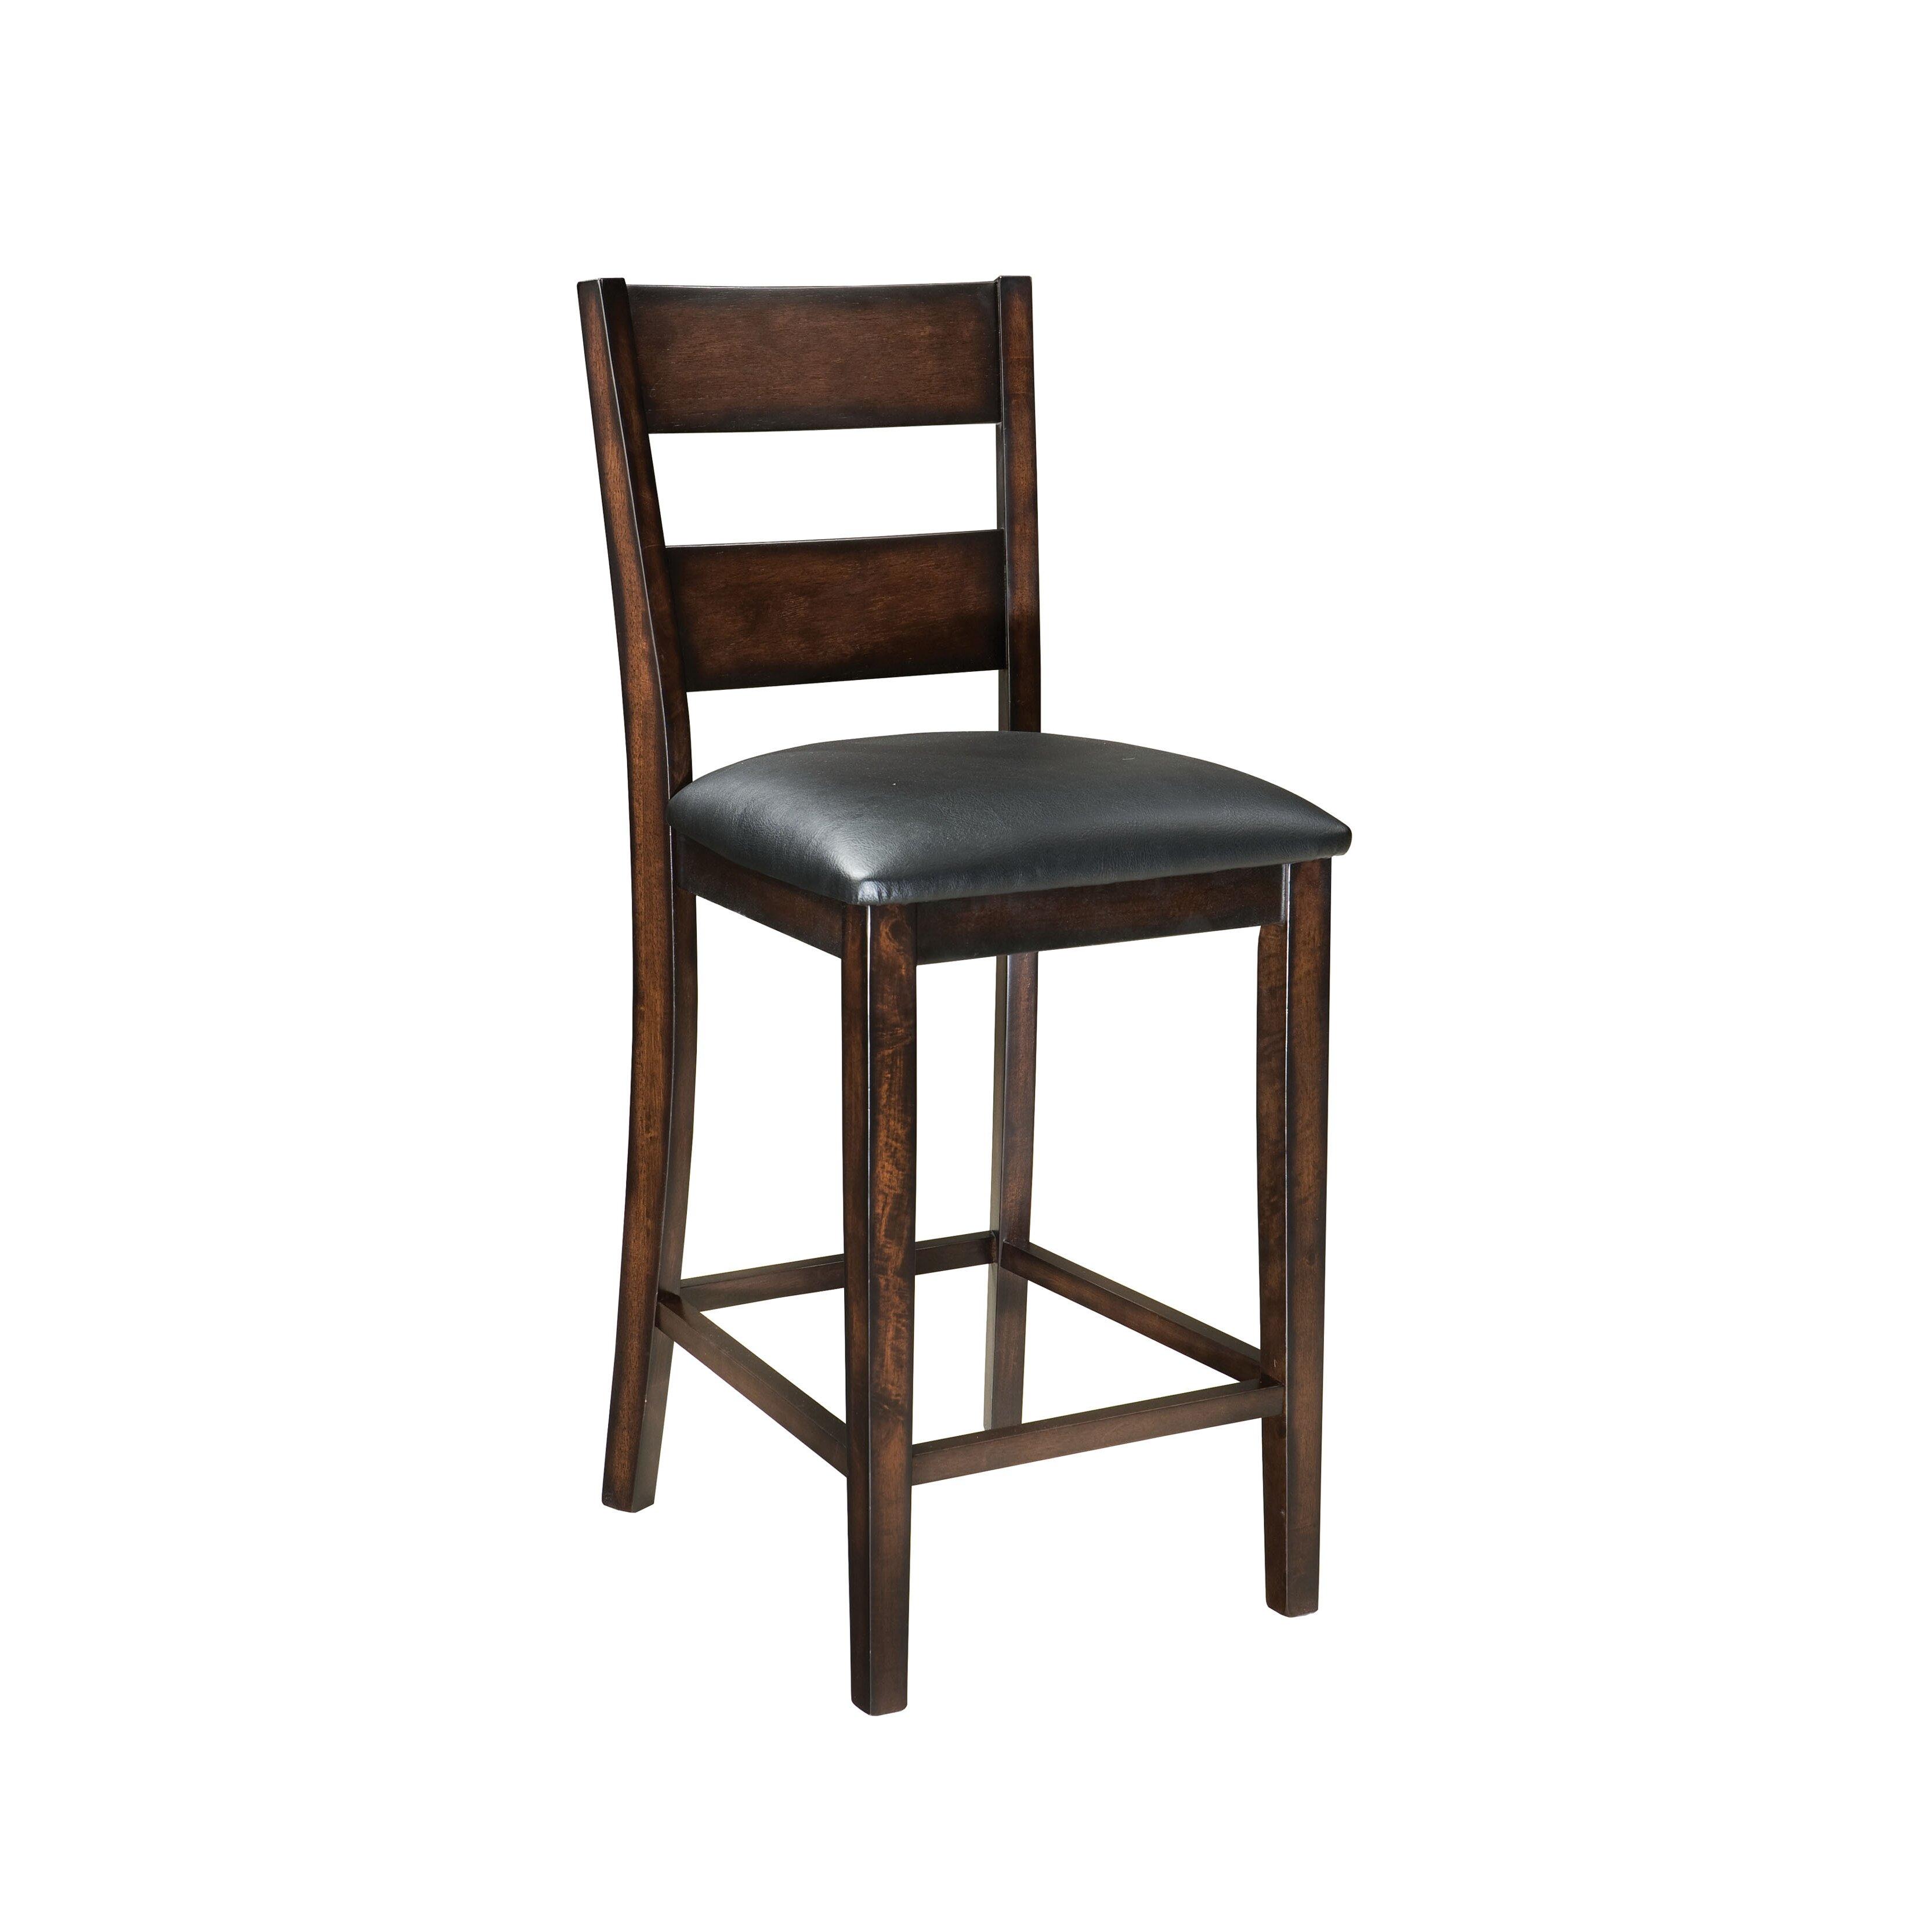 Standard furniture 24 bar stool wayfair - Standard height for bar stools ...